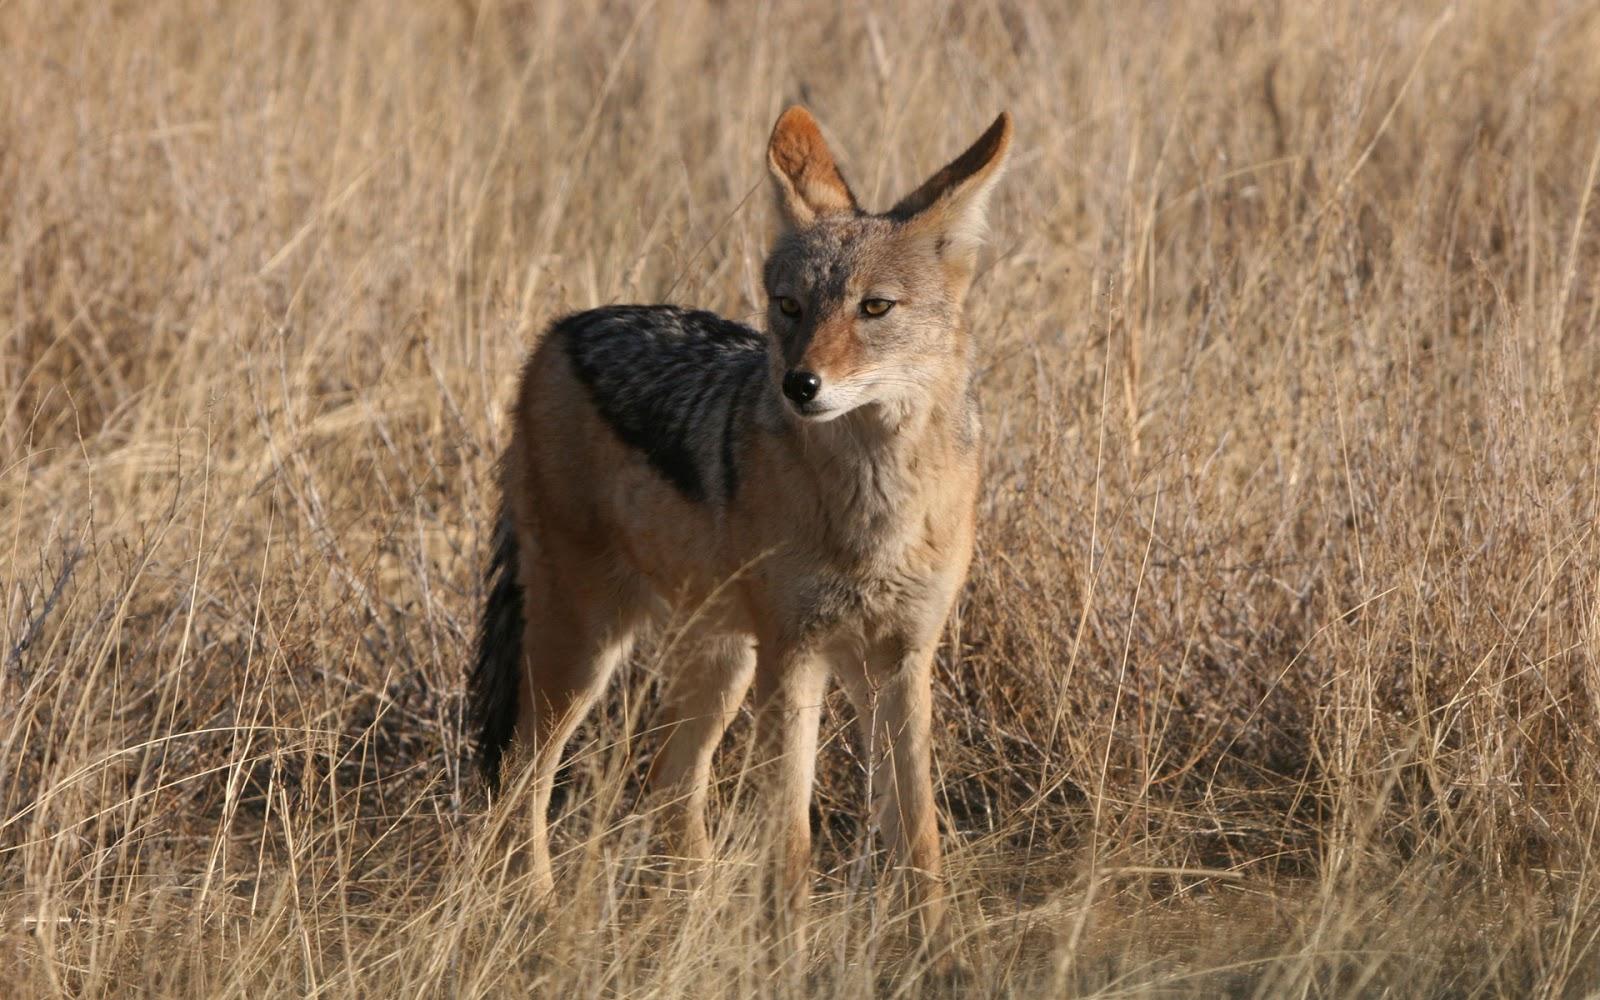 http://1.bp.blogspot.com/-3ClWIMFGJ4g/UHmSvZa9f6I/AAAAAAABT8E/3DZuI5-WCis/s1600/fox-wildlife-animals-wallpaper-11502.jpg